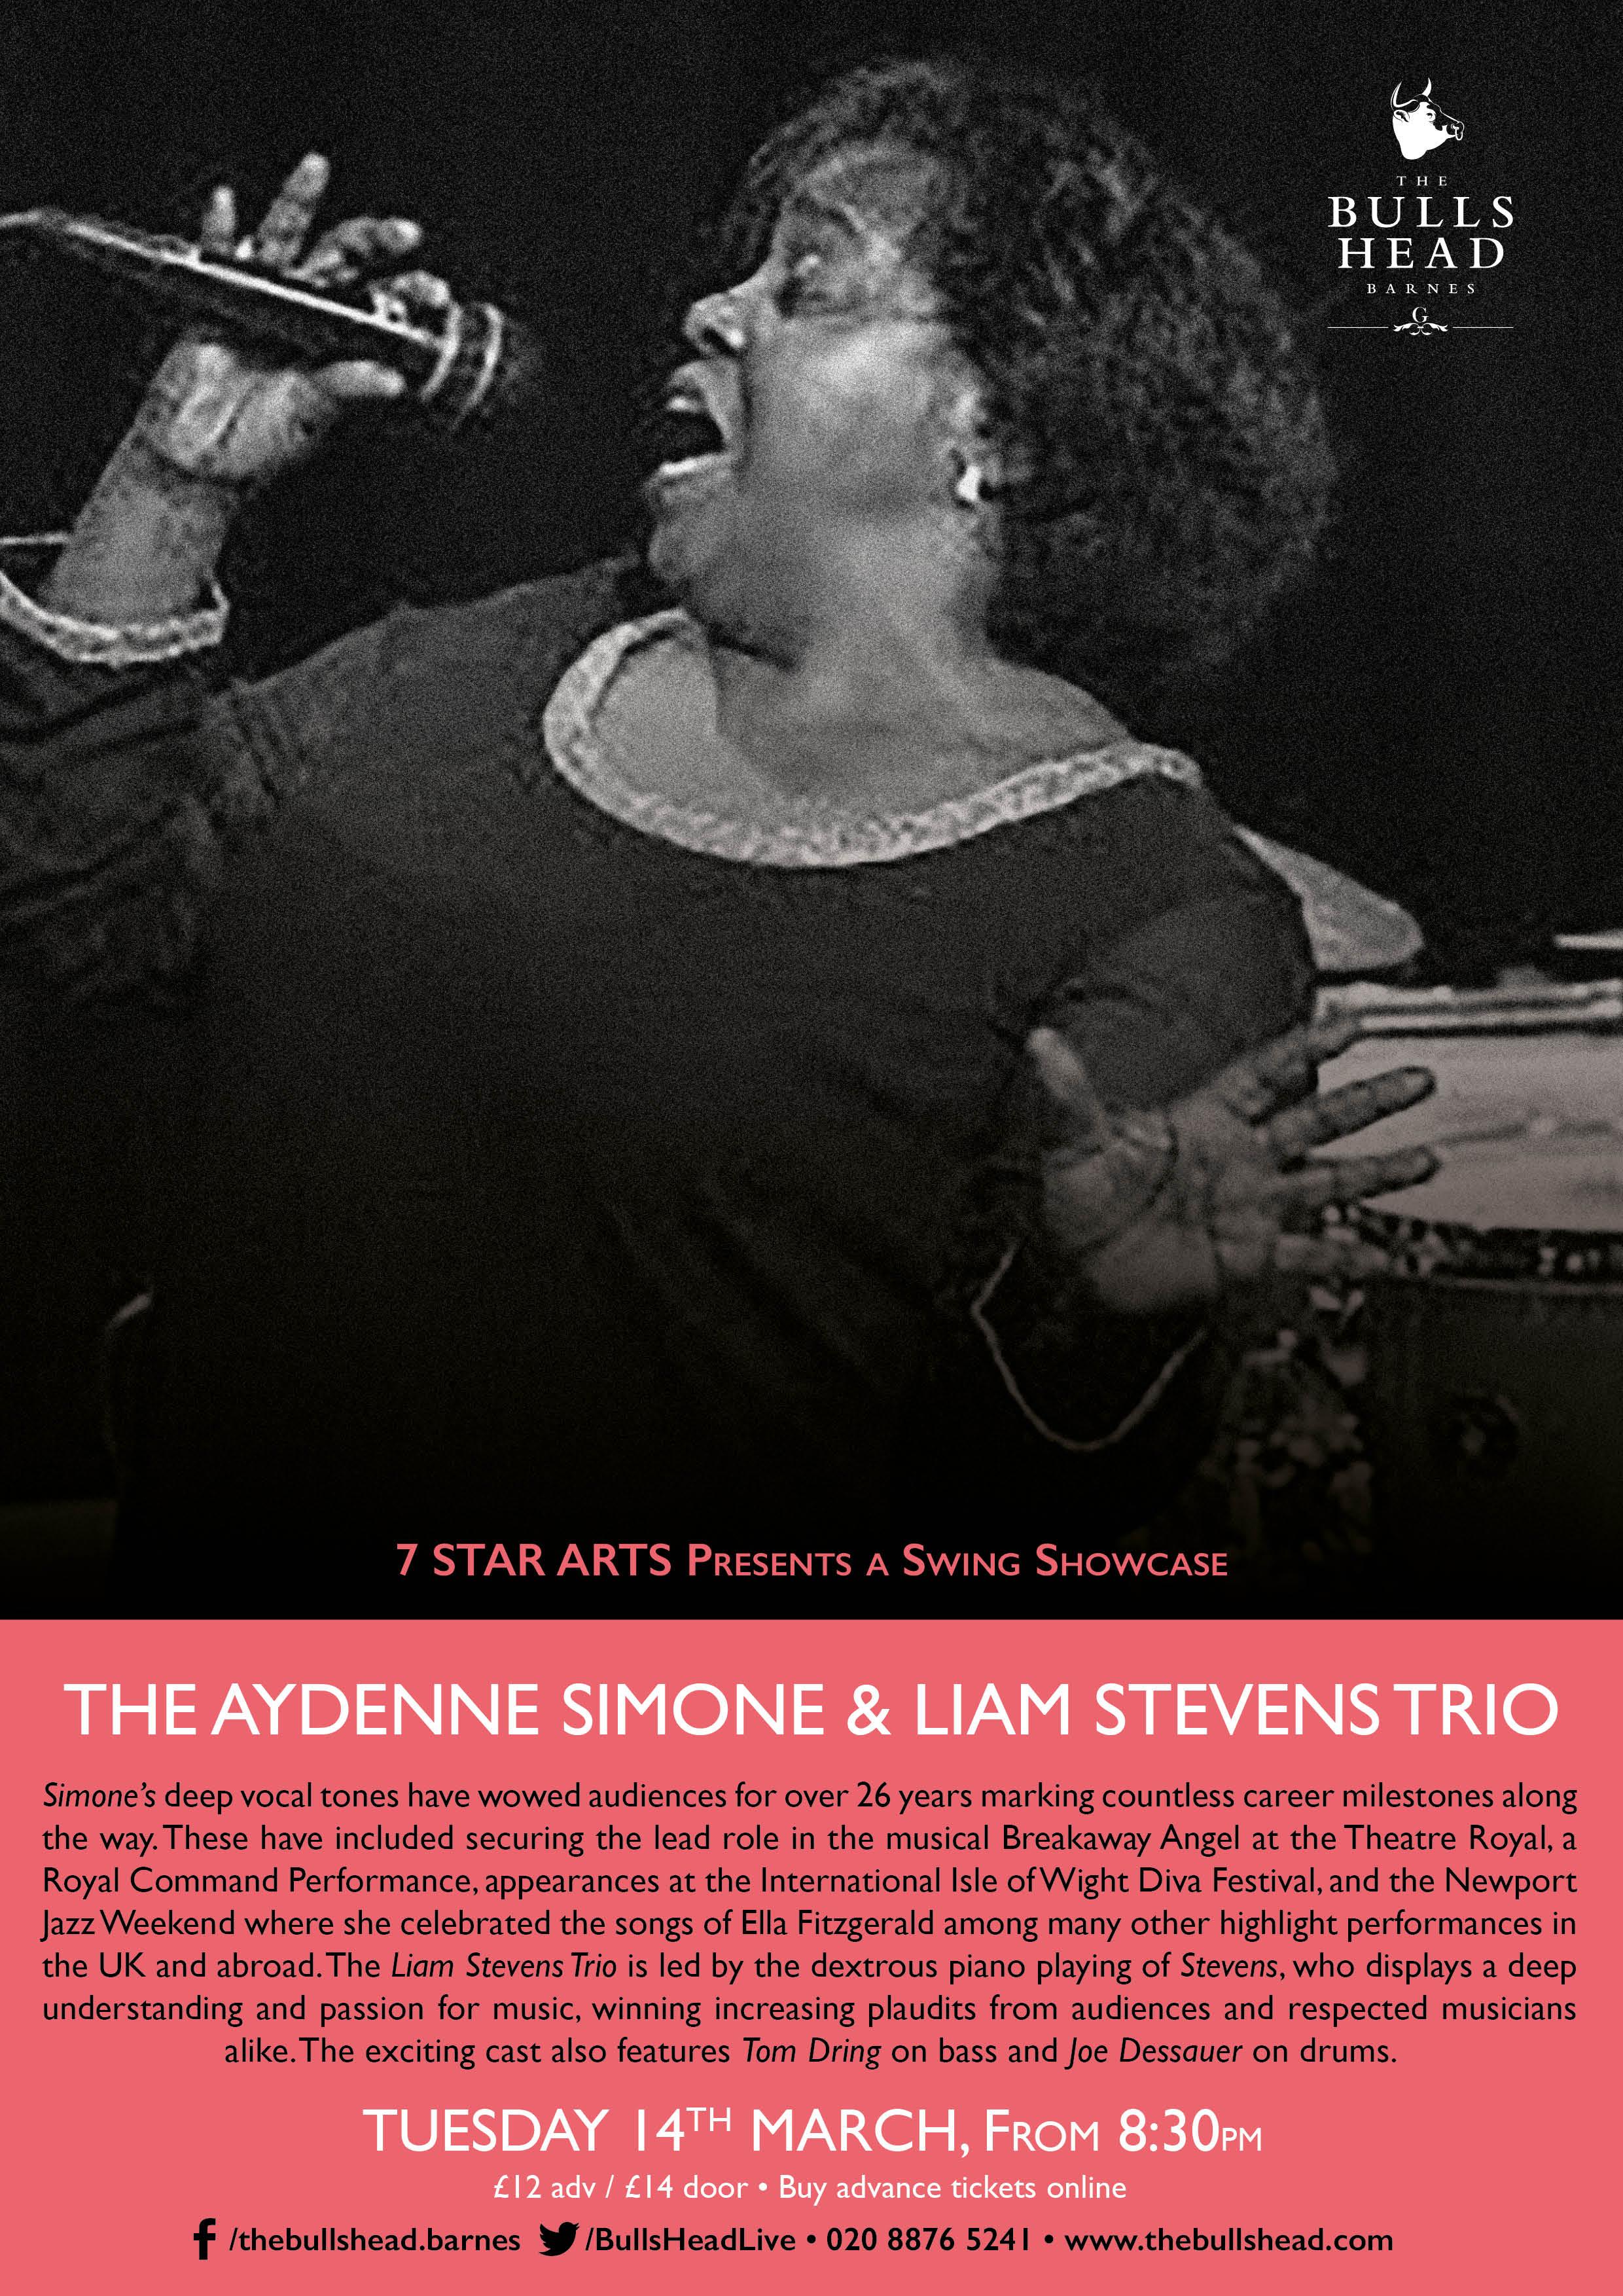 The Aydenne Simone & Liam Stevens Trio Swing Showcase